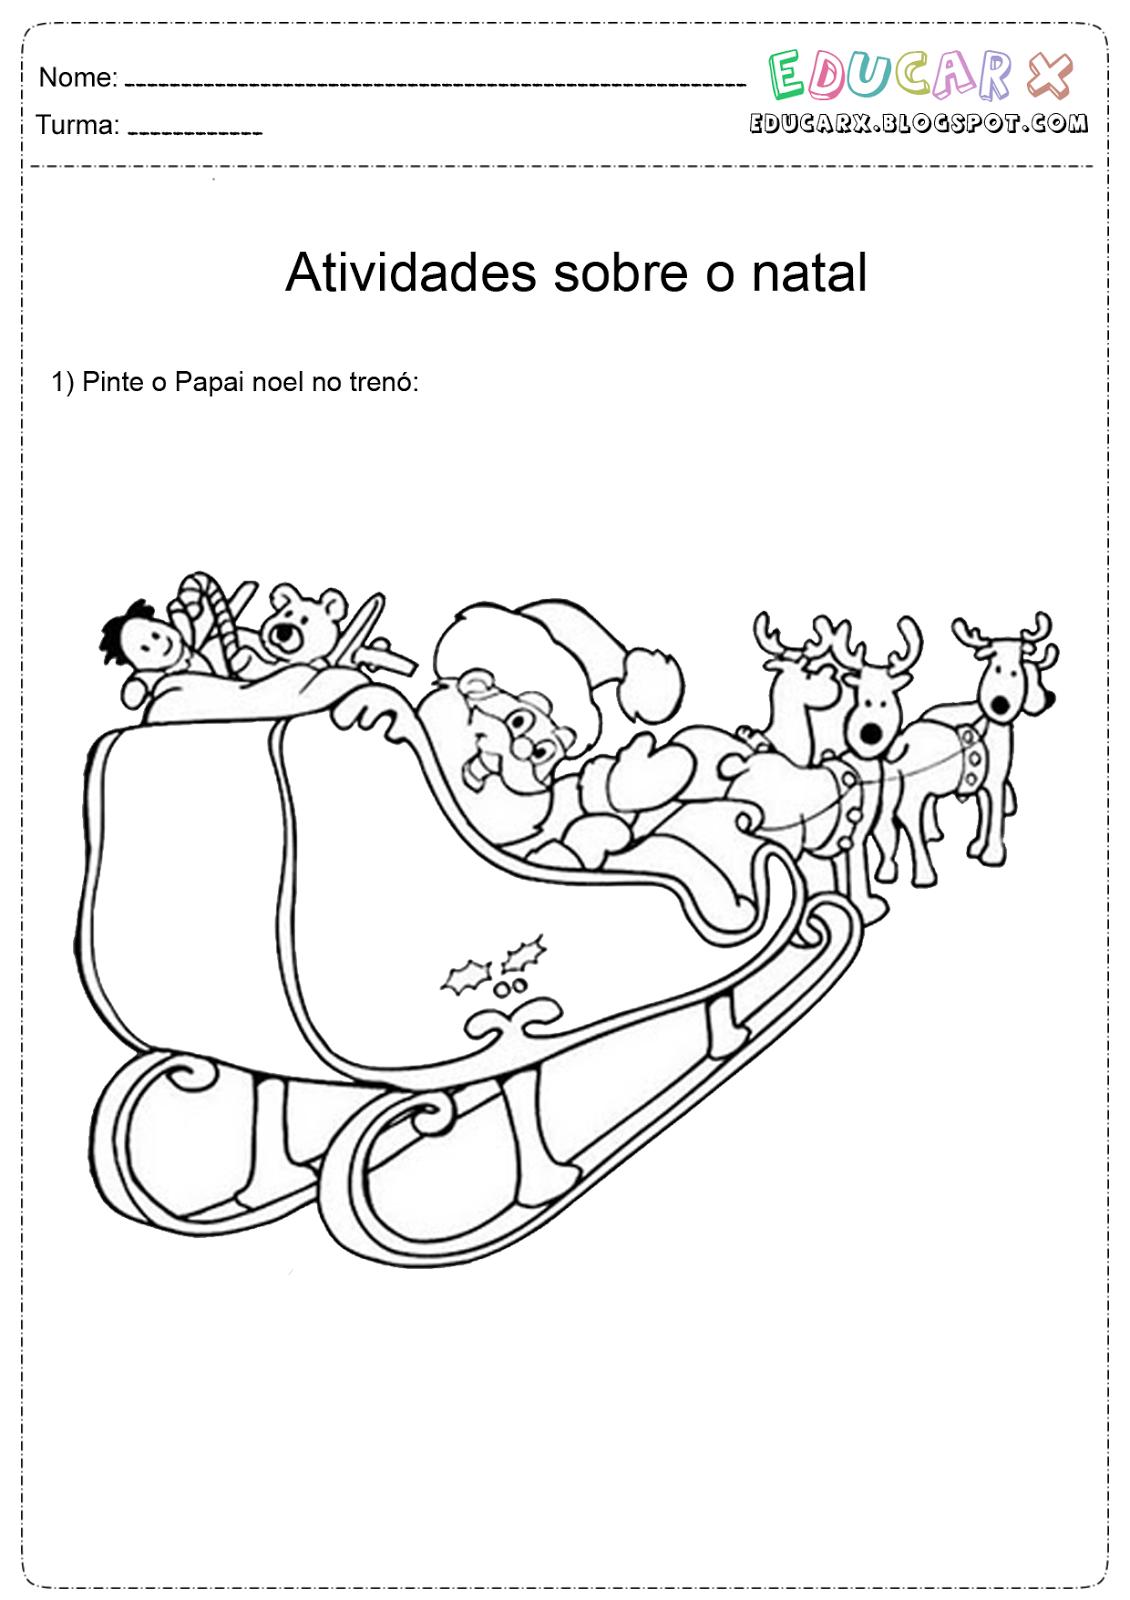 Desenho do trenó do Papai Noel para colorir Hello Kids - imagens de papai noel no trenó para colorir